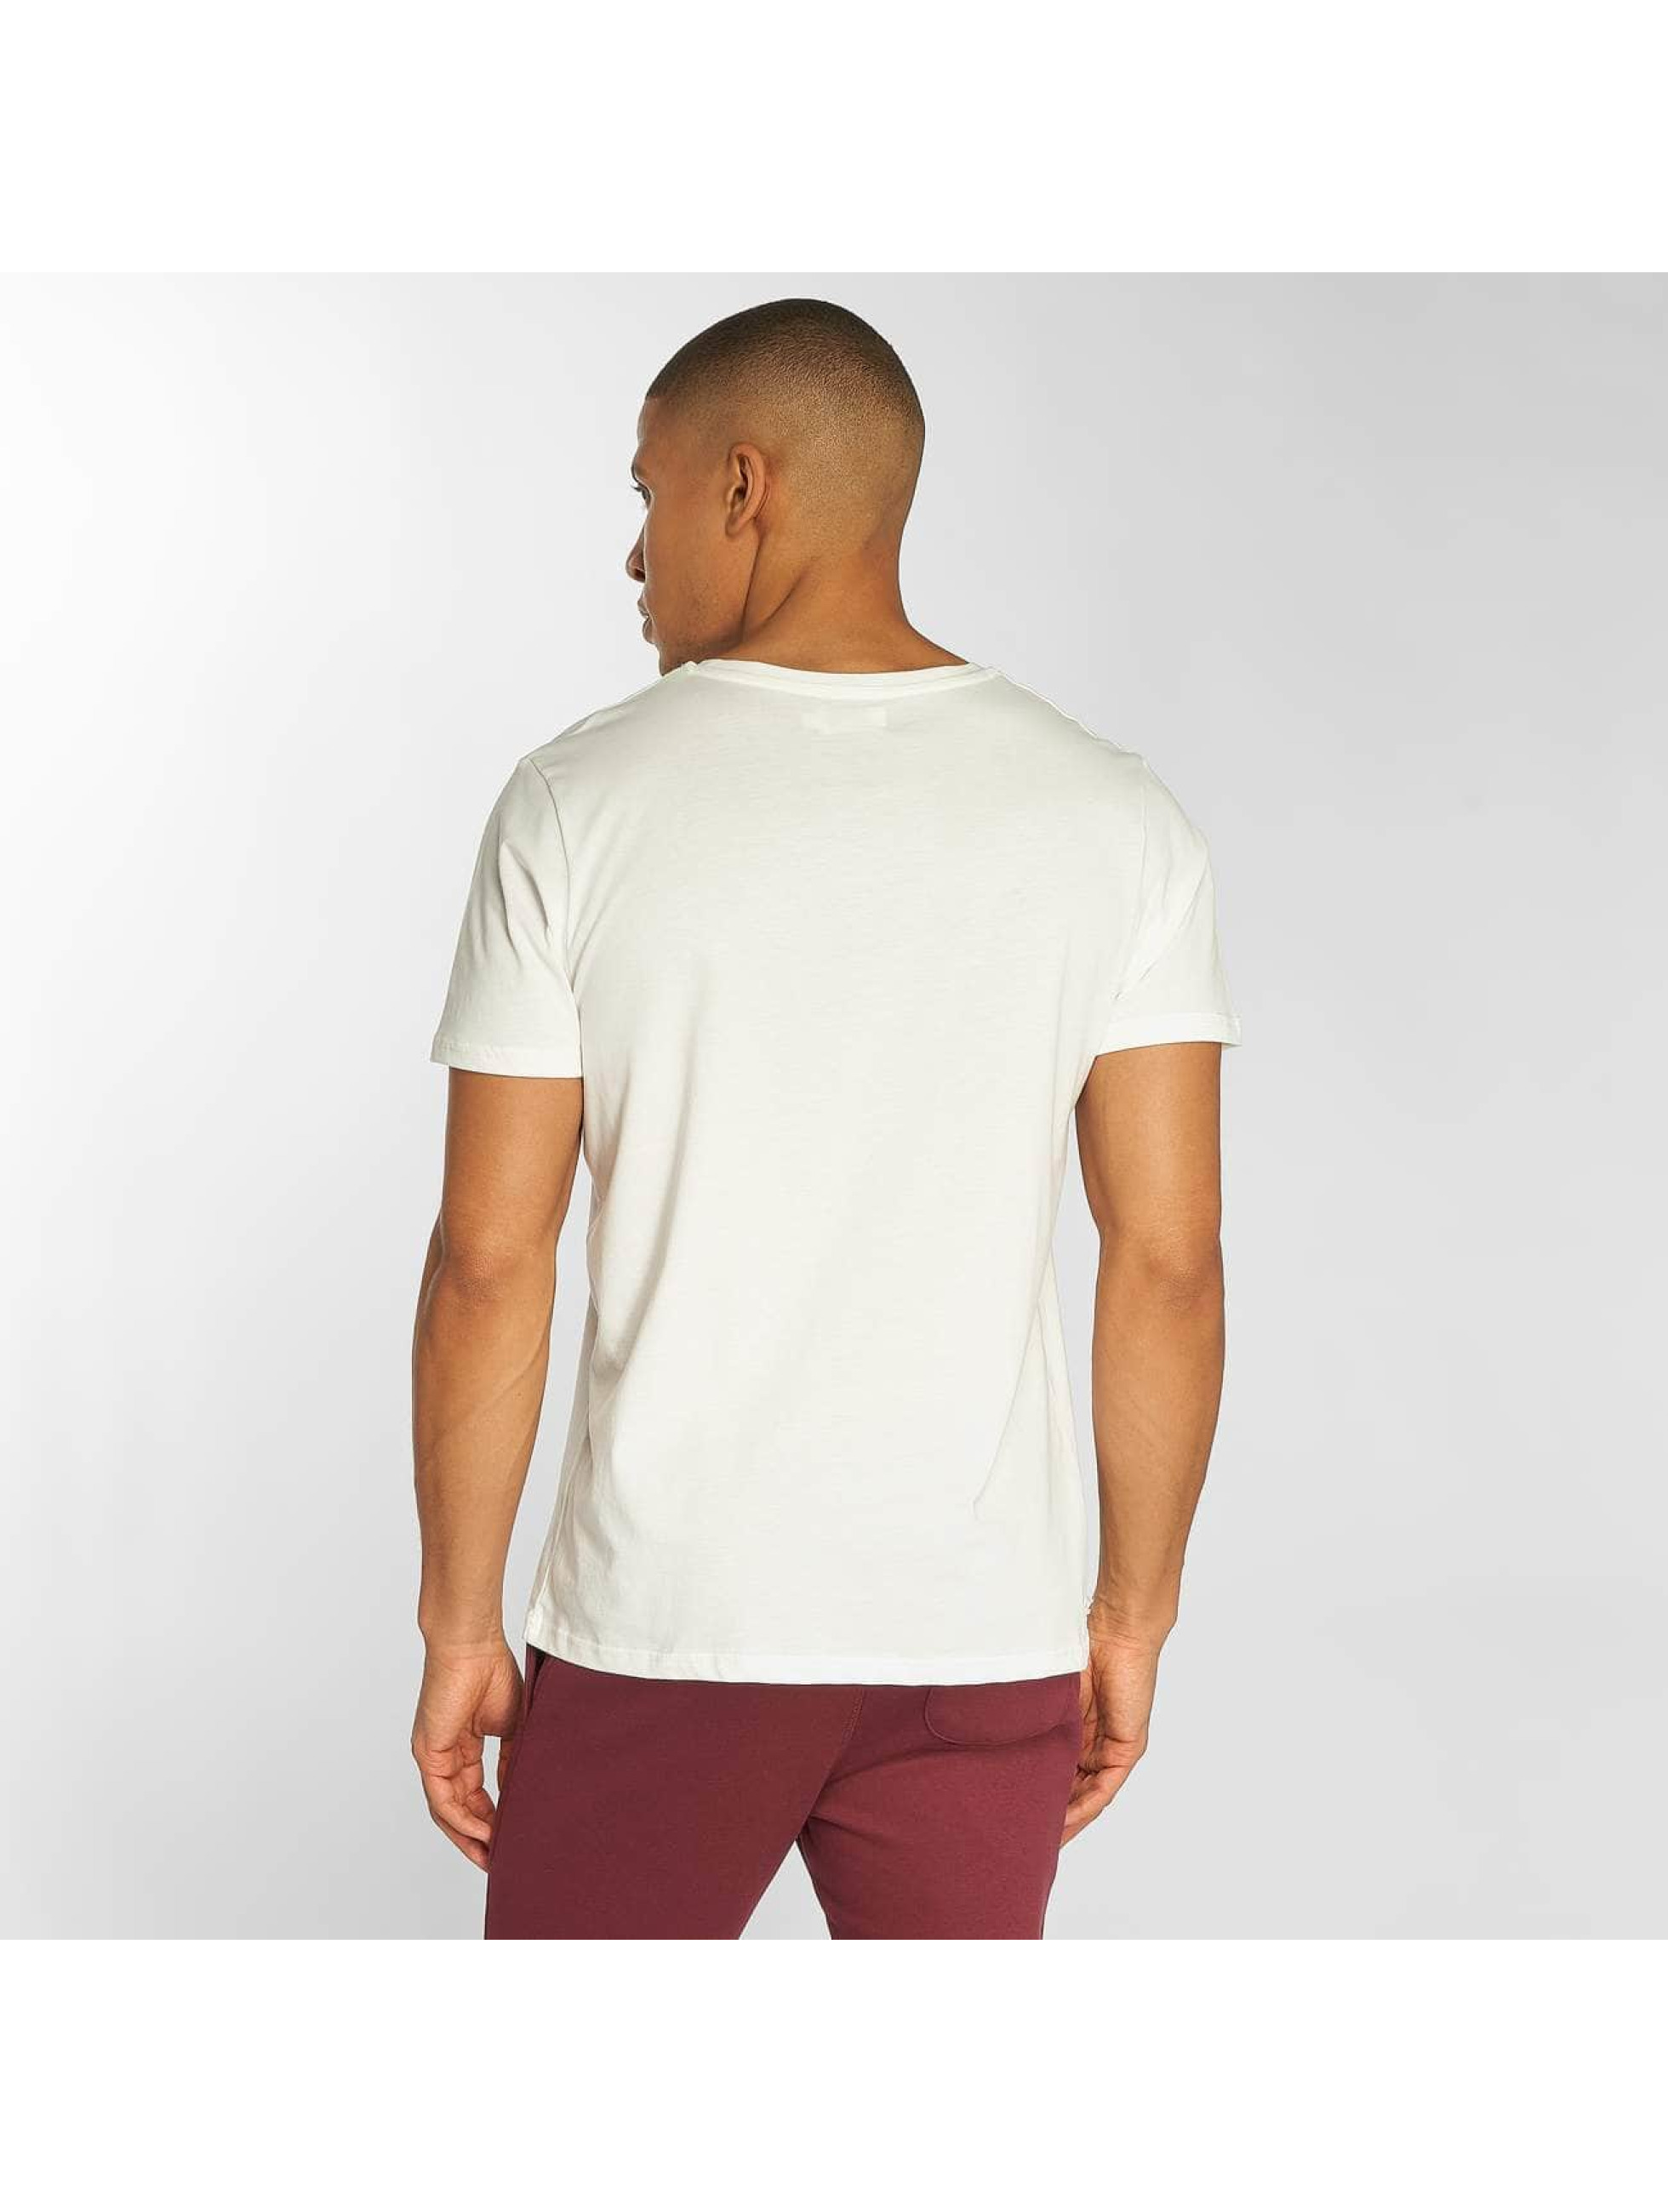 Kulte t-shirt Acapulco wit